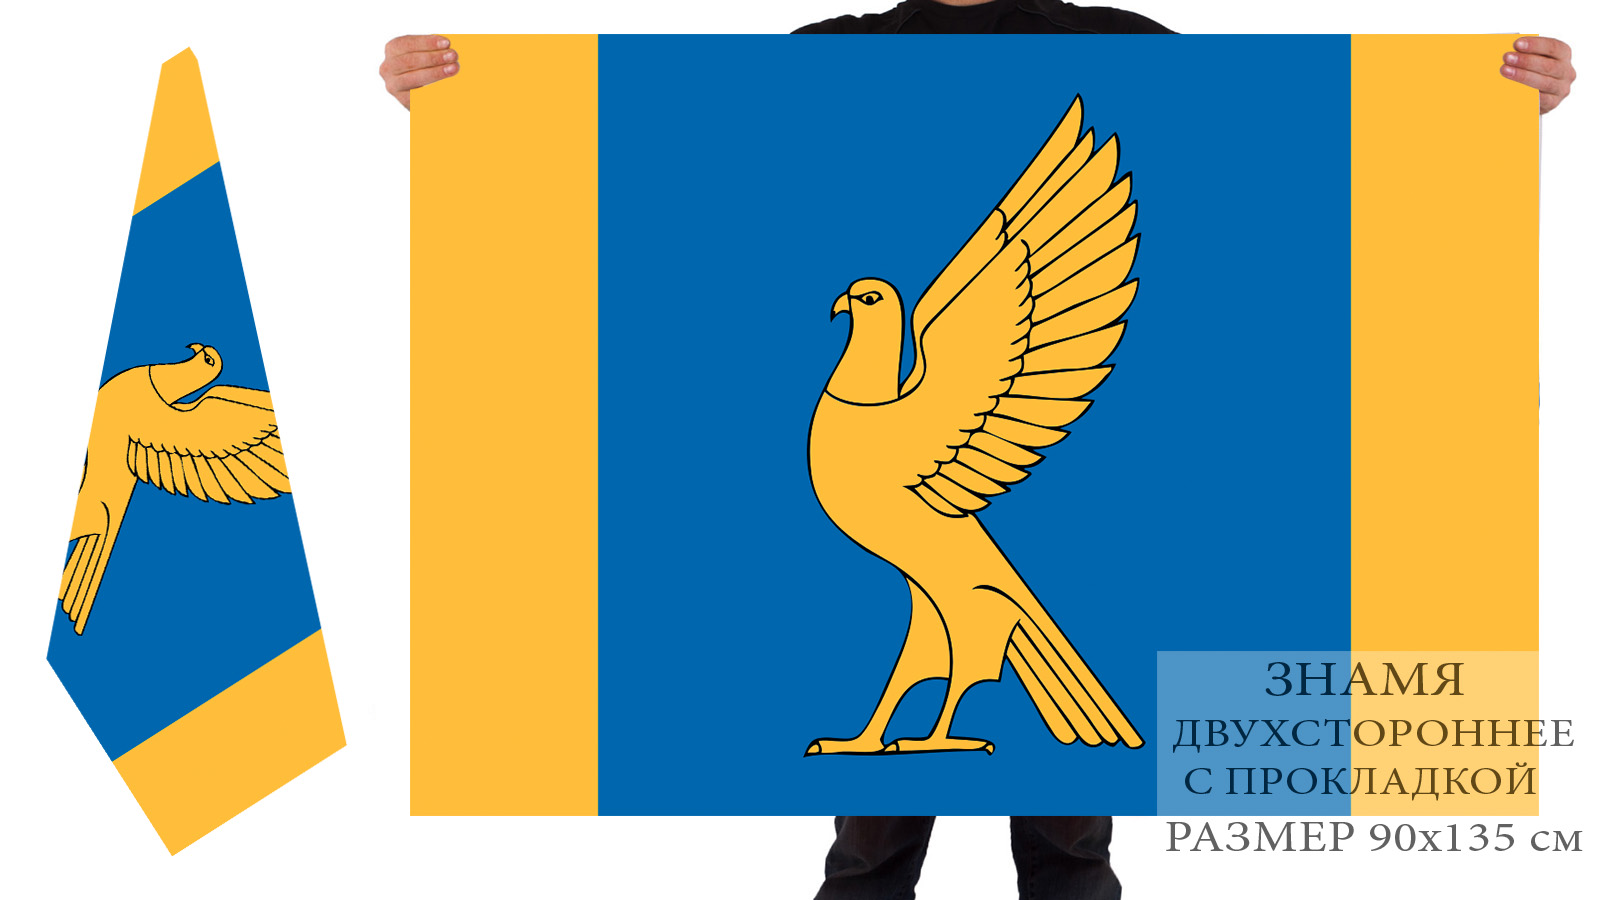 Заказать двухсторонний флаг Кумертау